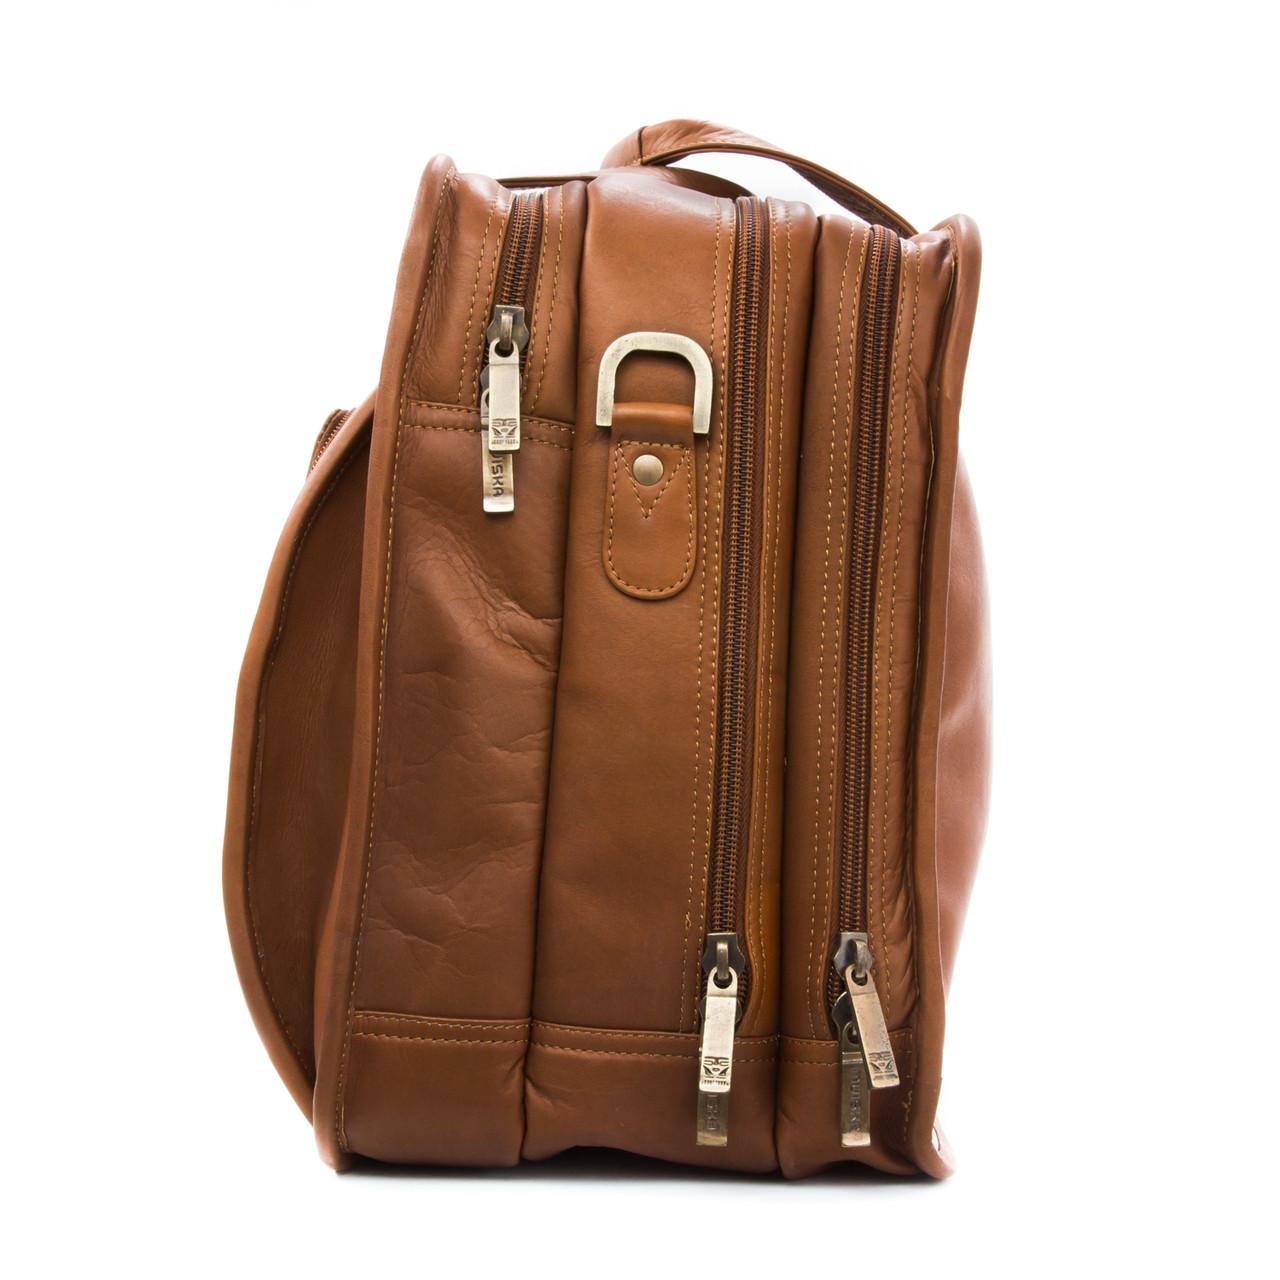 Muiska - Sydney - 17-inch Triple Compartment Laptop Brief